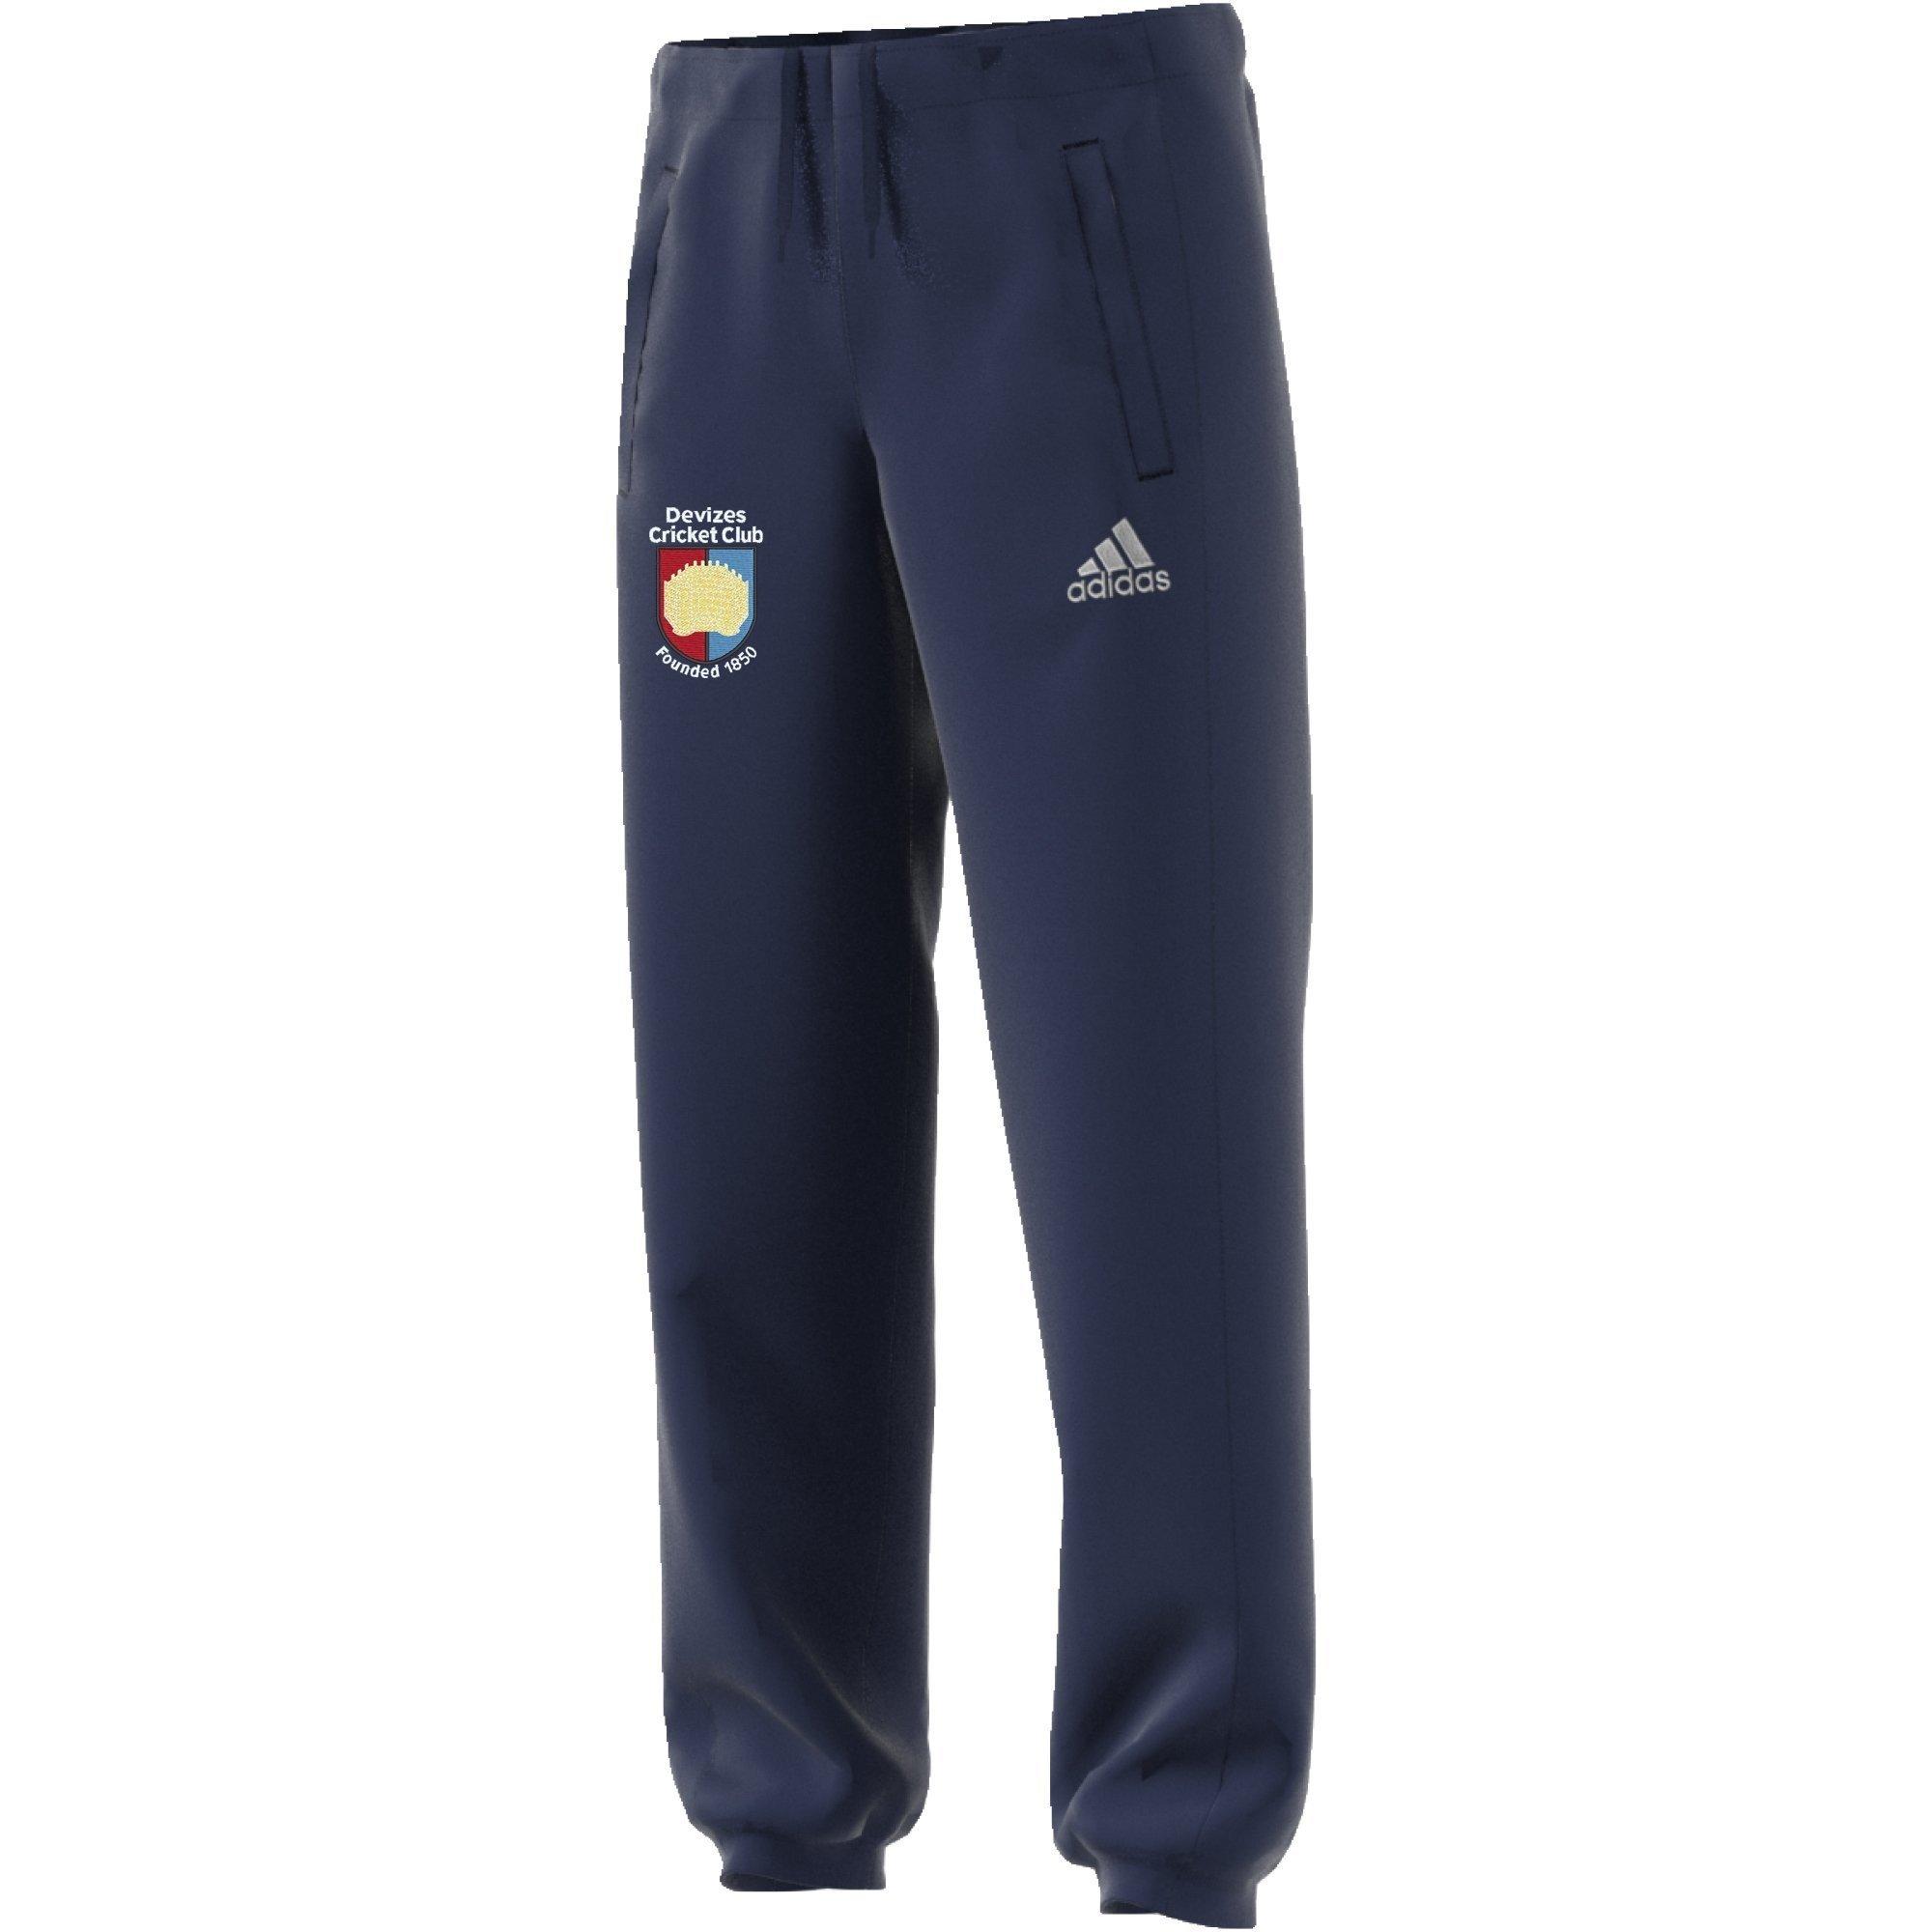 Devizes CC Adidas Navy Sweat Pants